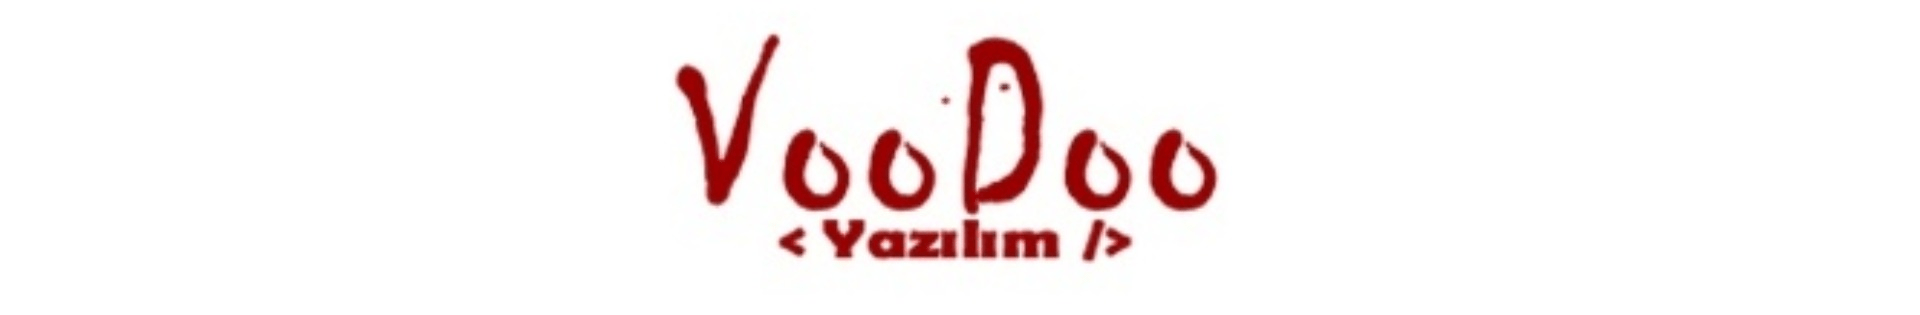 Voodoo Yazılım